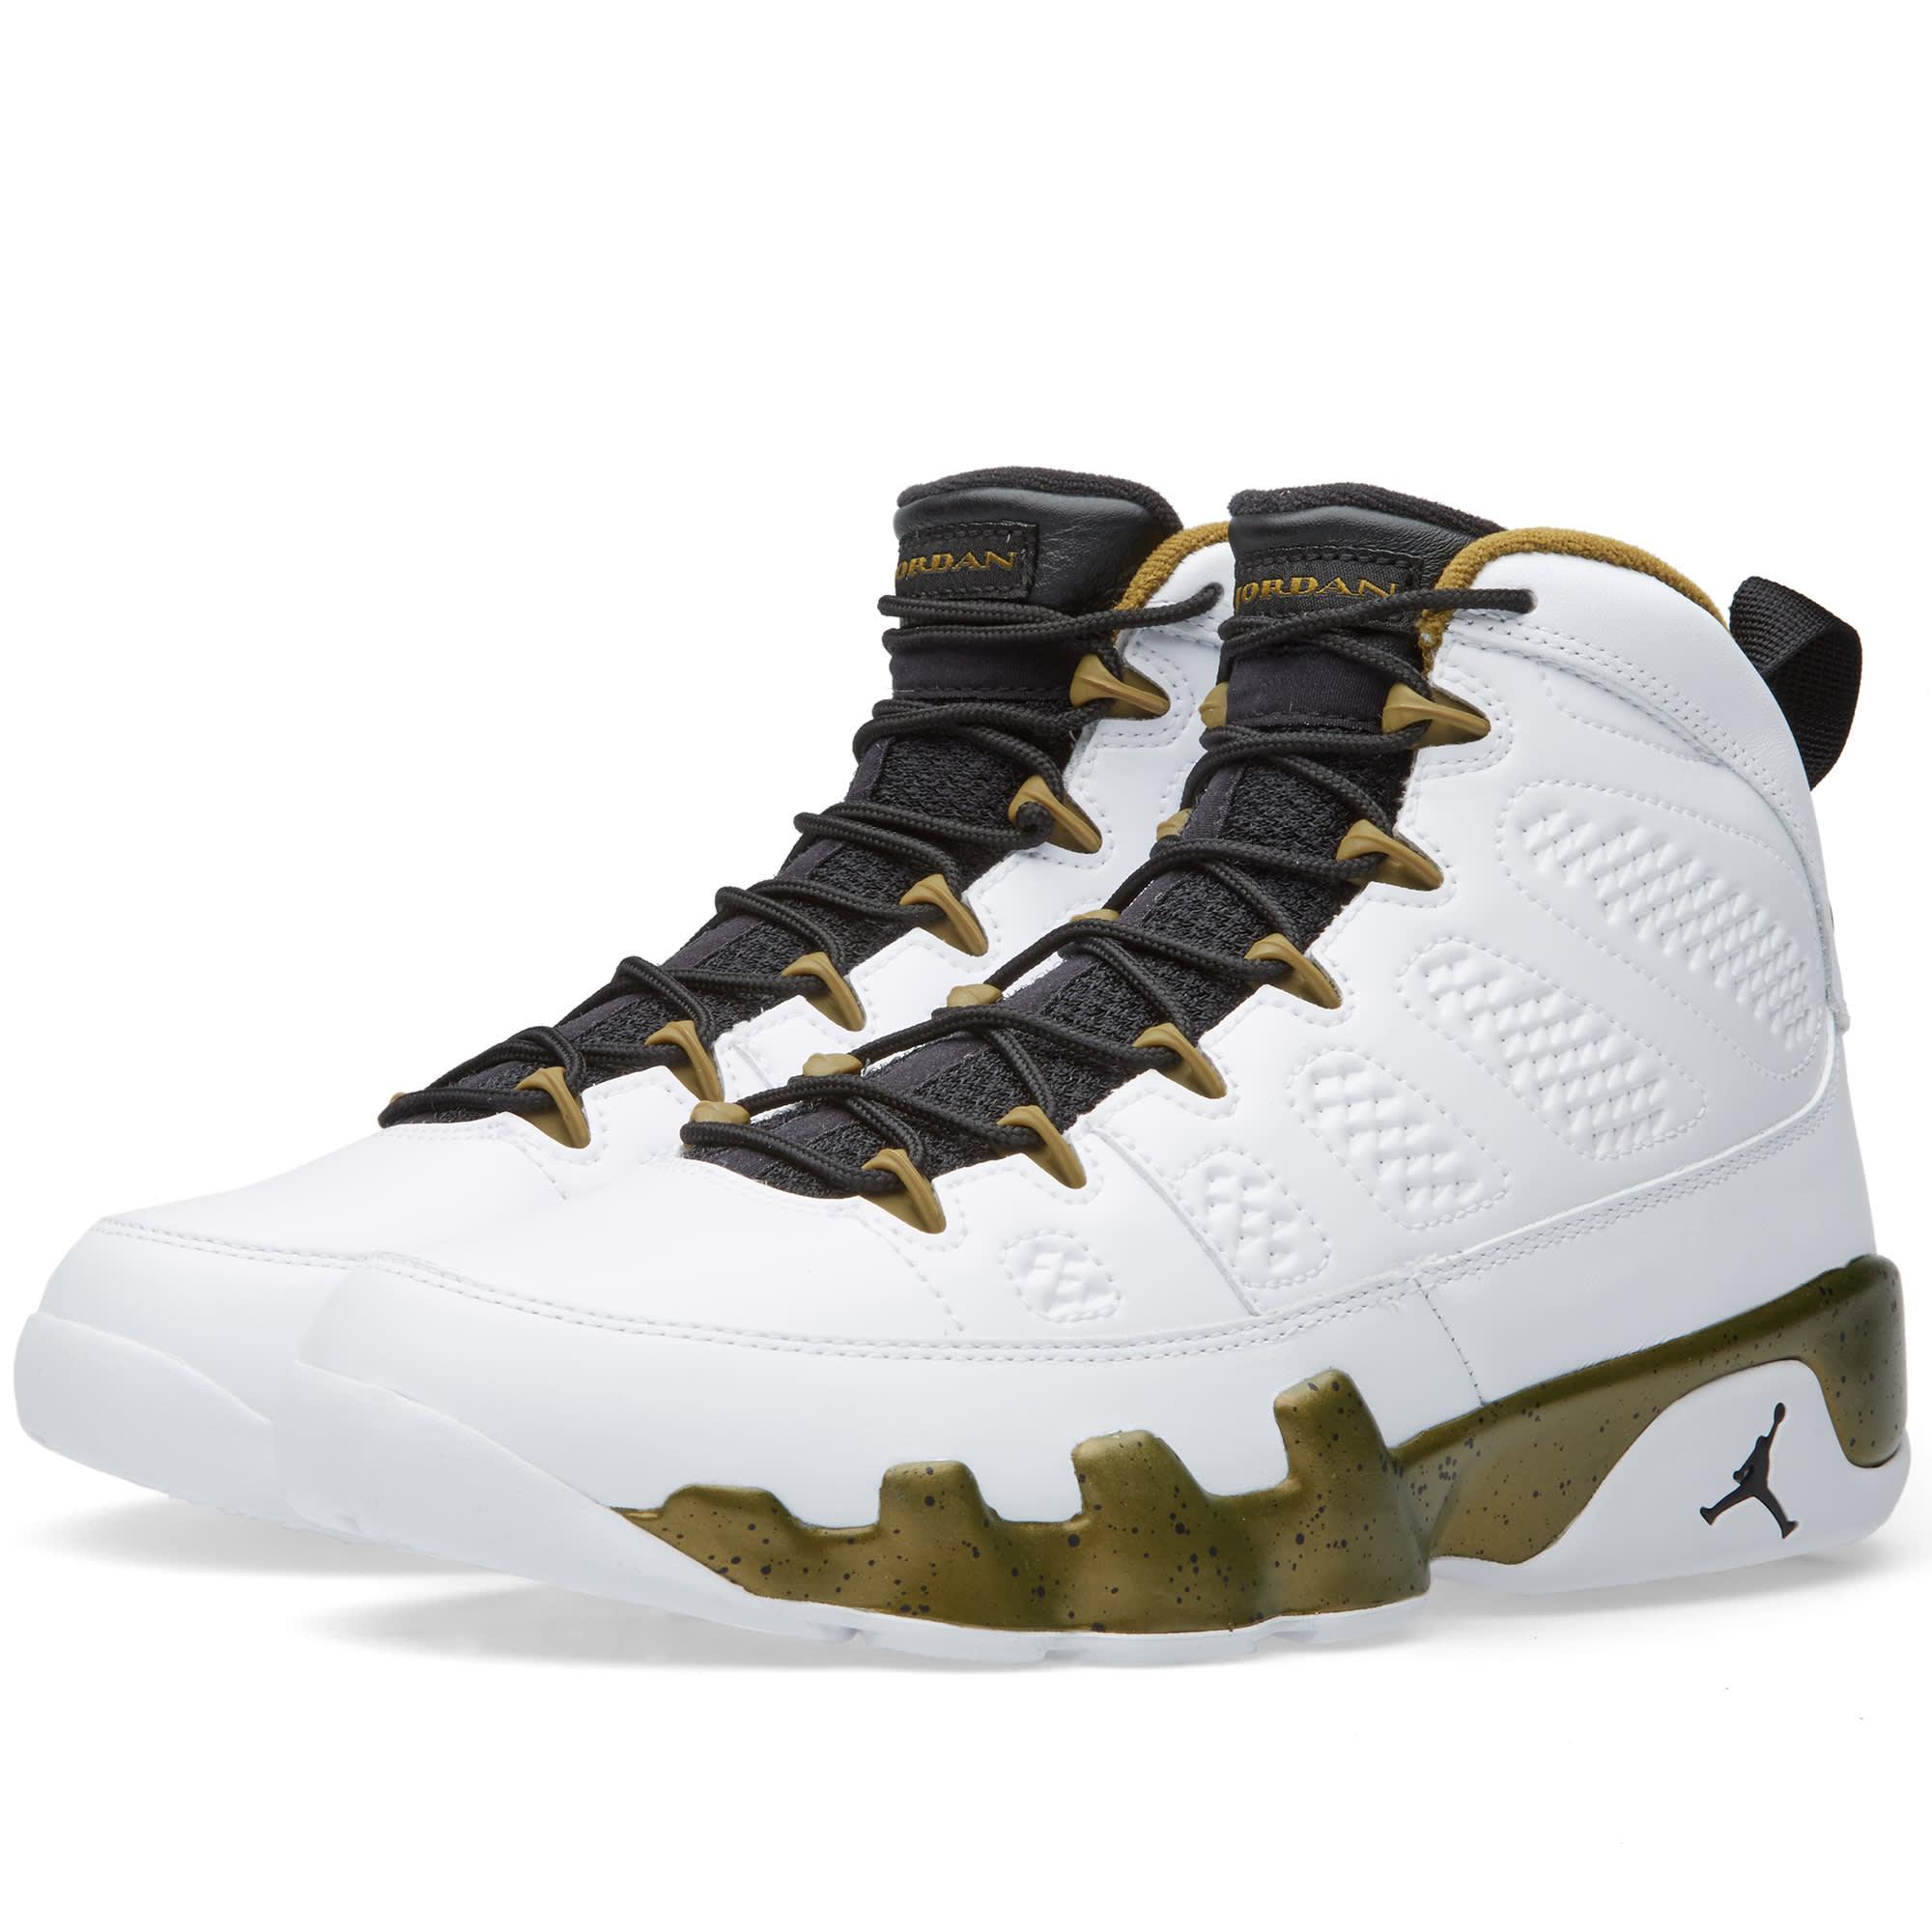 4889382dcd165c Nike Air Jordan 9 Retro  The Spirit  White